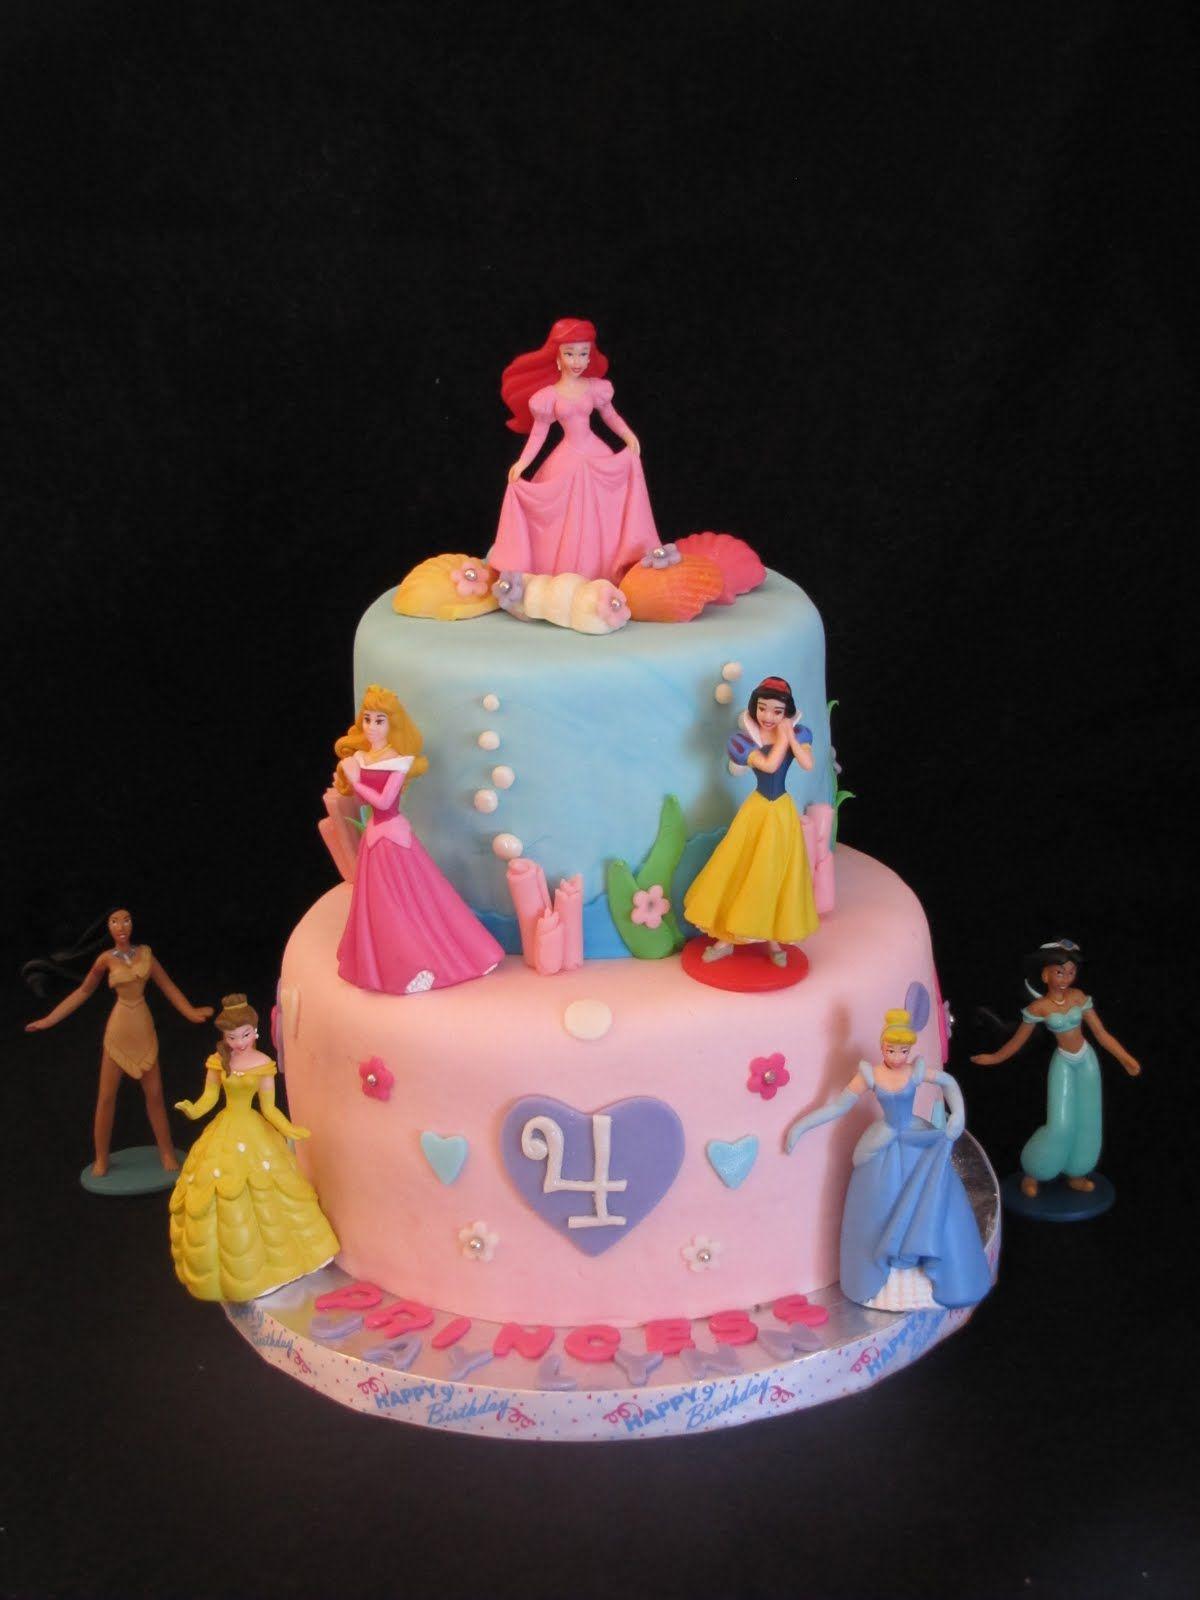 Disney Princess Cake N We Do This Ashley Phipps I